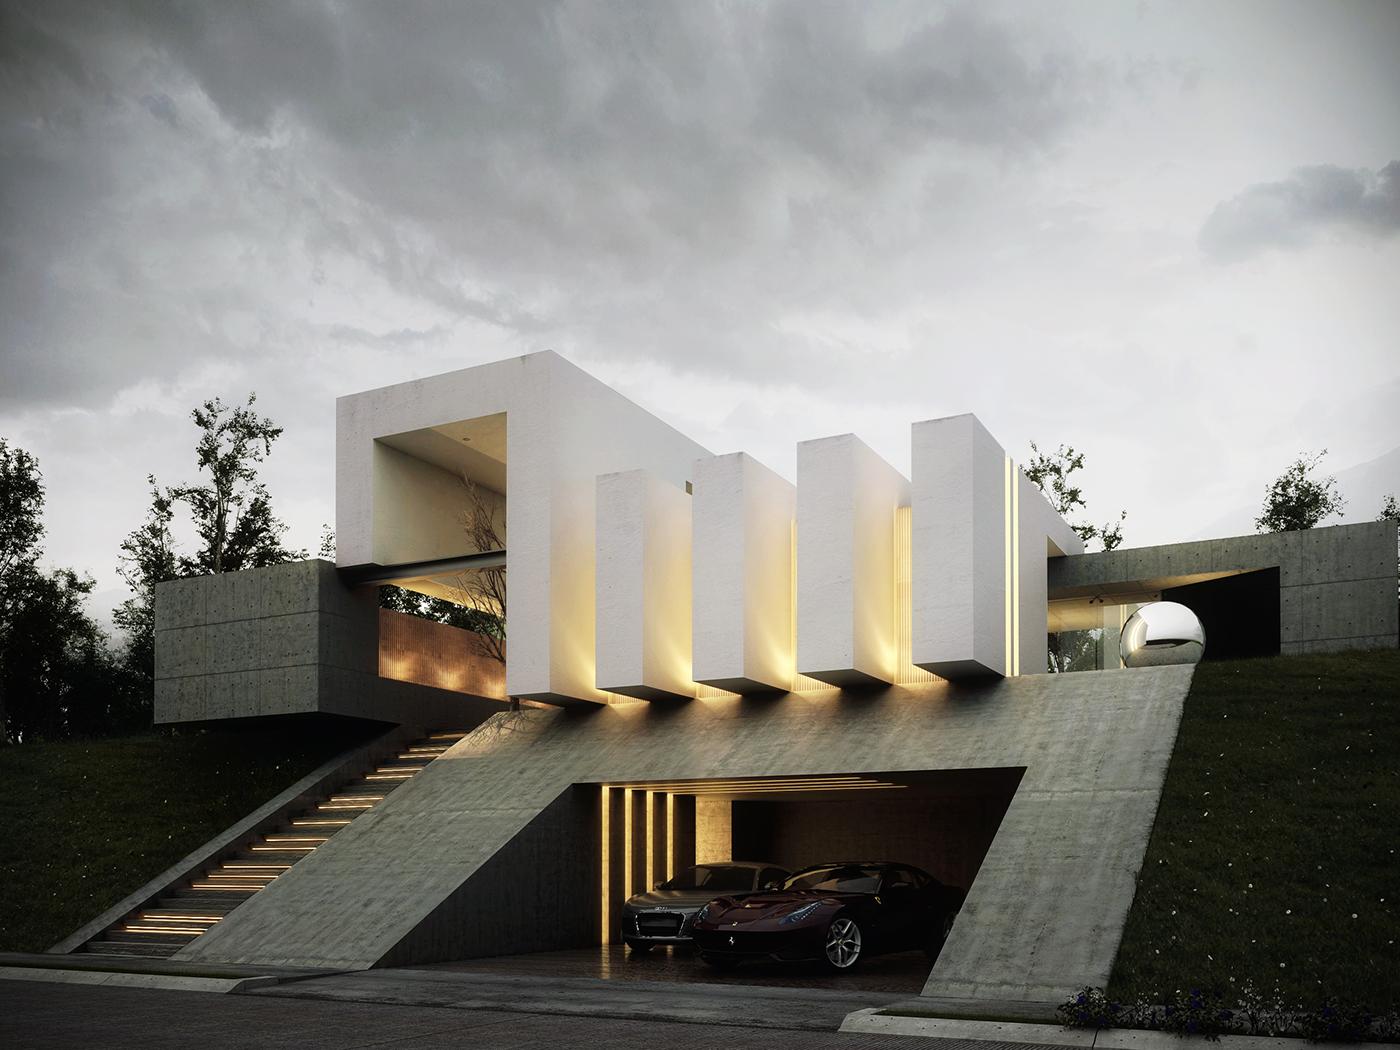 residential in united arab emirates architecture in 2019 rh pinterest com